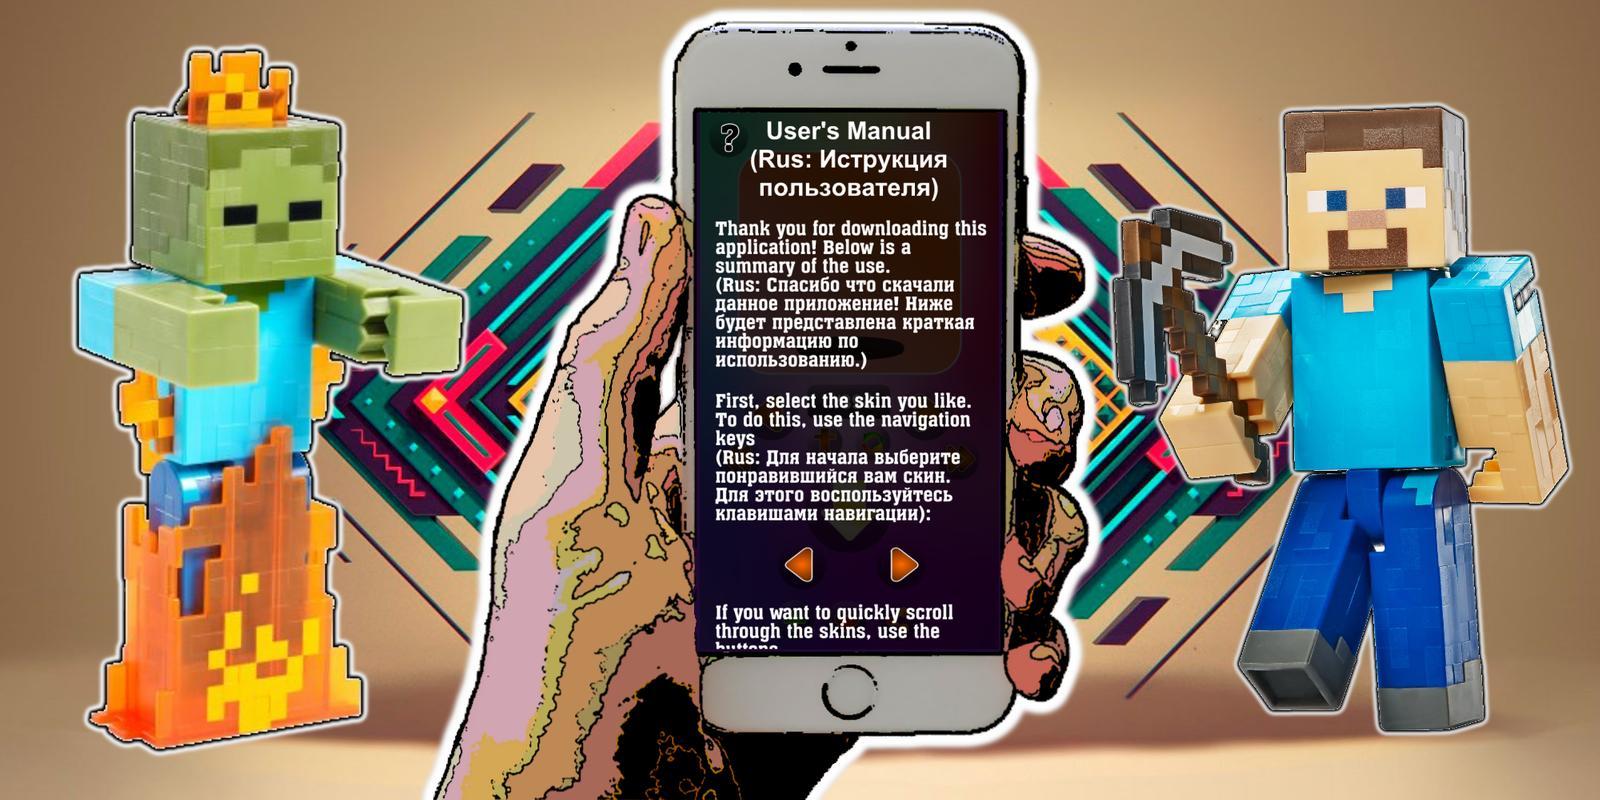 Jeff The Killer Skin For MCPE For Android APK Download - Skin para minecraft pe de sasuke